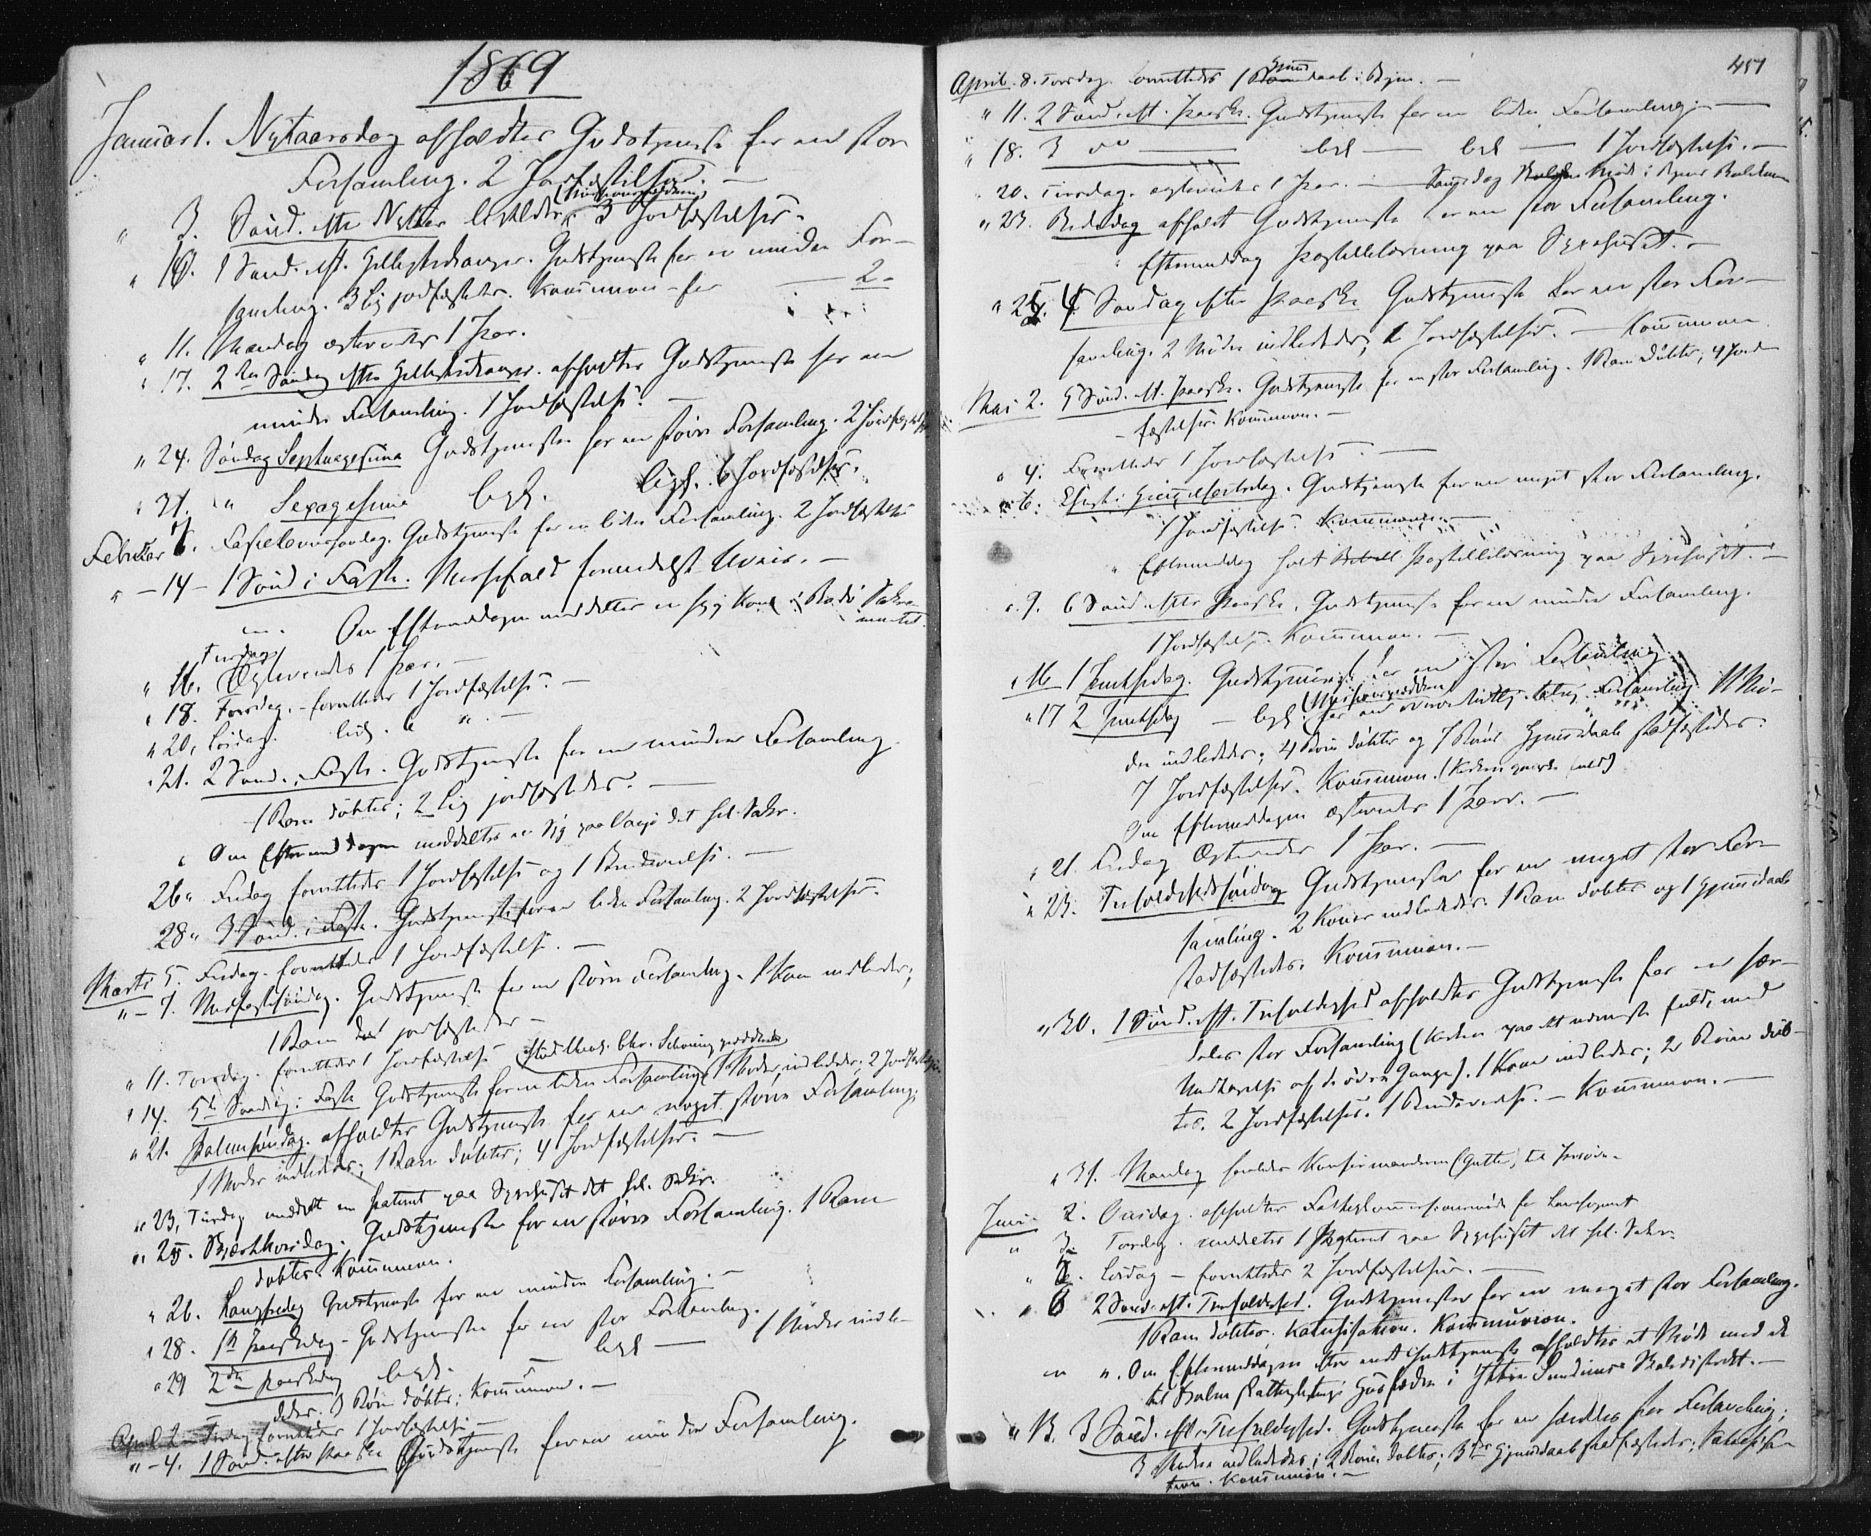 SAT, Ministerialprotokoller, klokkerbøker og fødselsregistre - Nordland, 801/L0008: Ministerialbok nr. 801A08, 1864-1875, s. 451